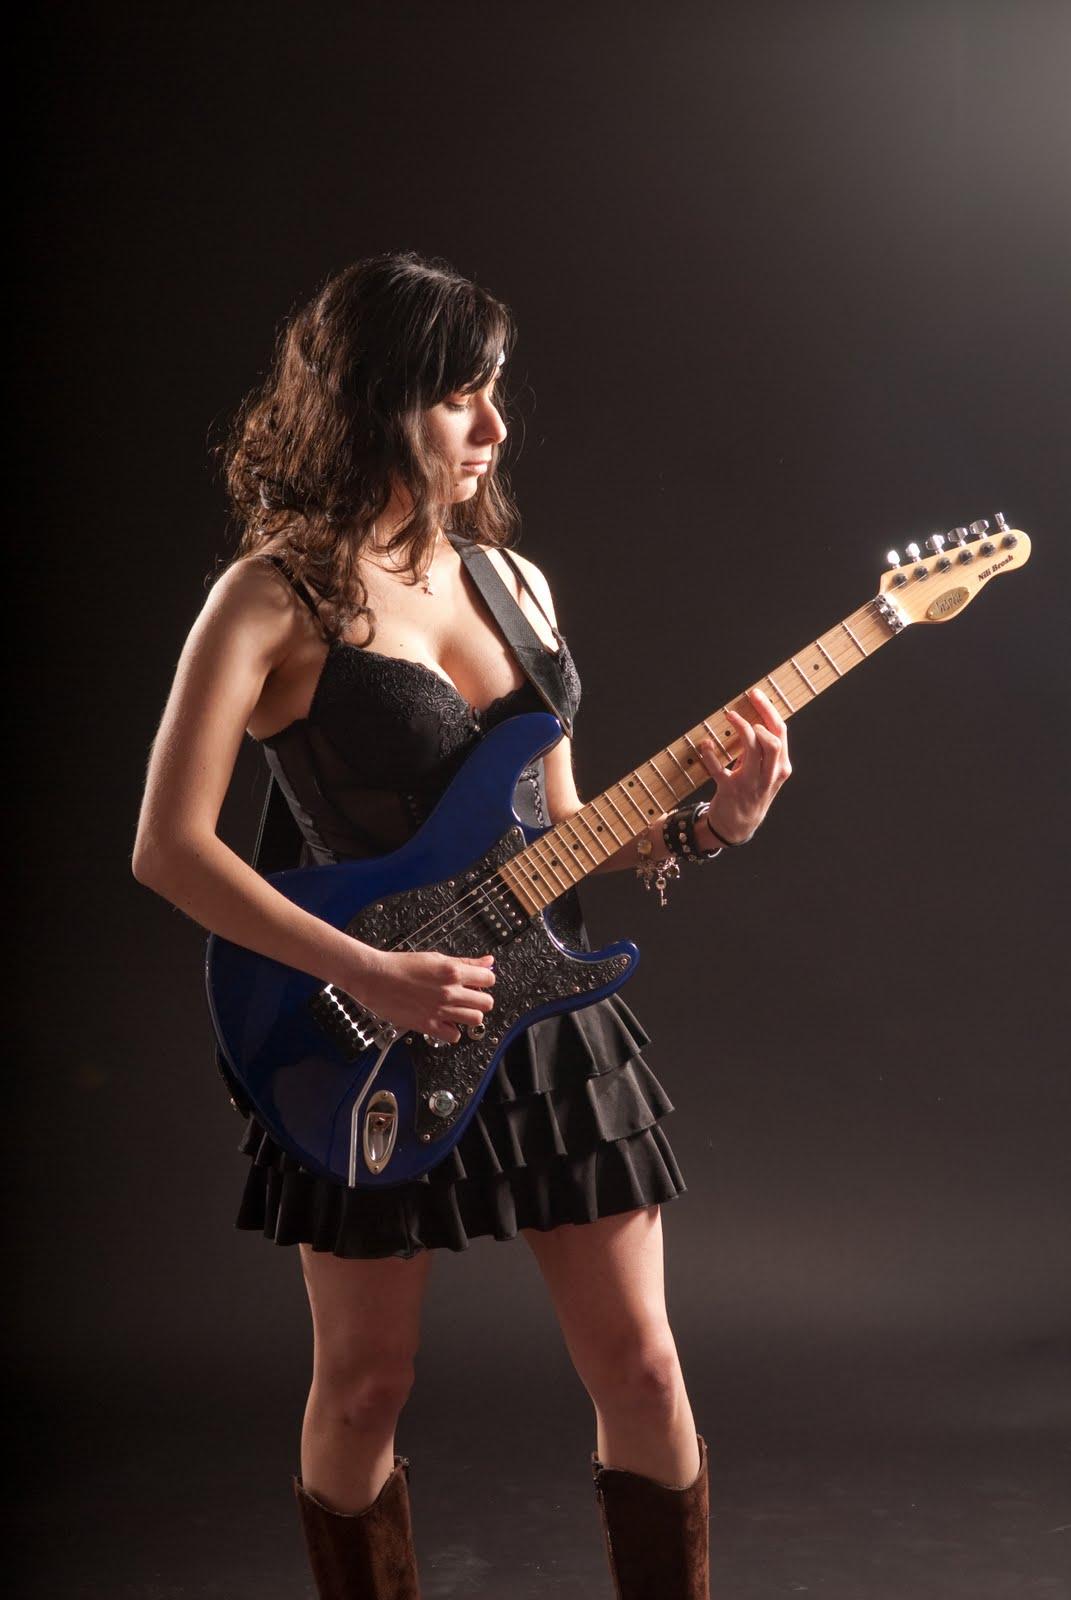 hot girl playing guitar naked